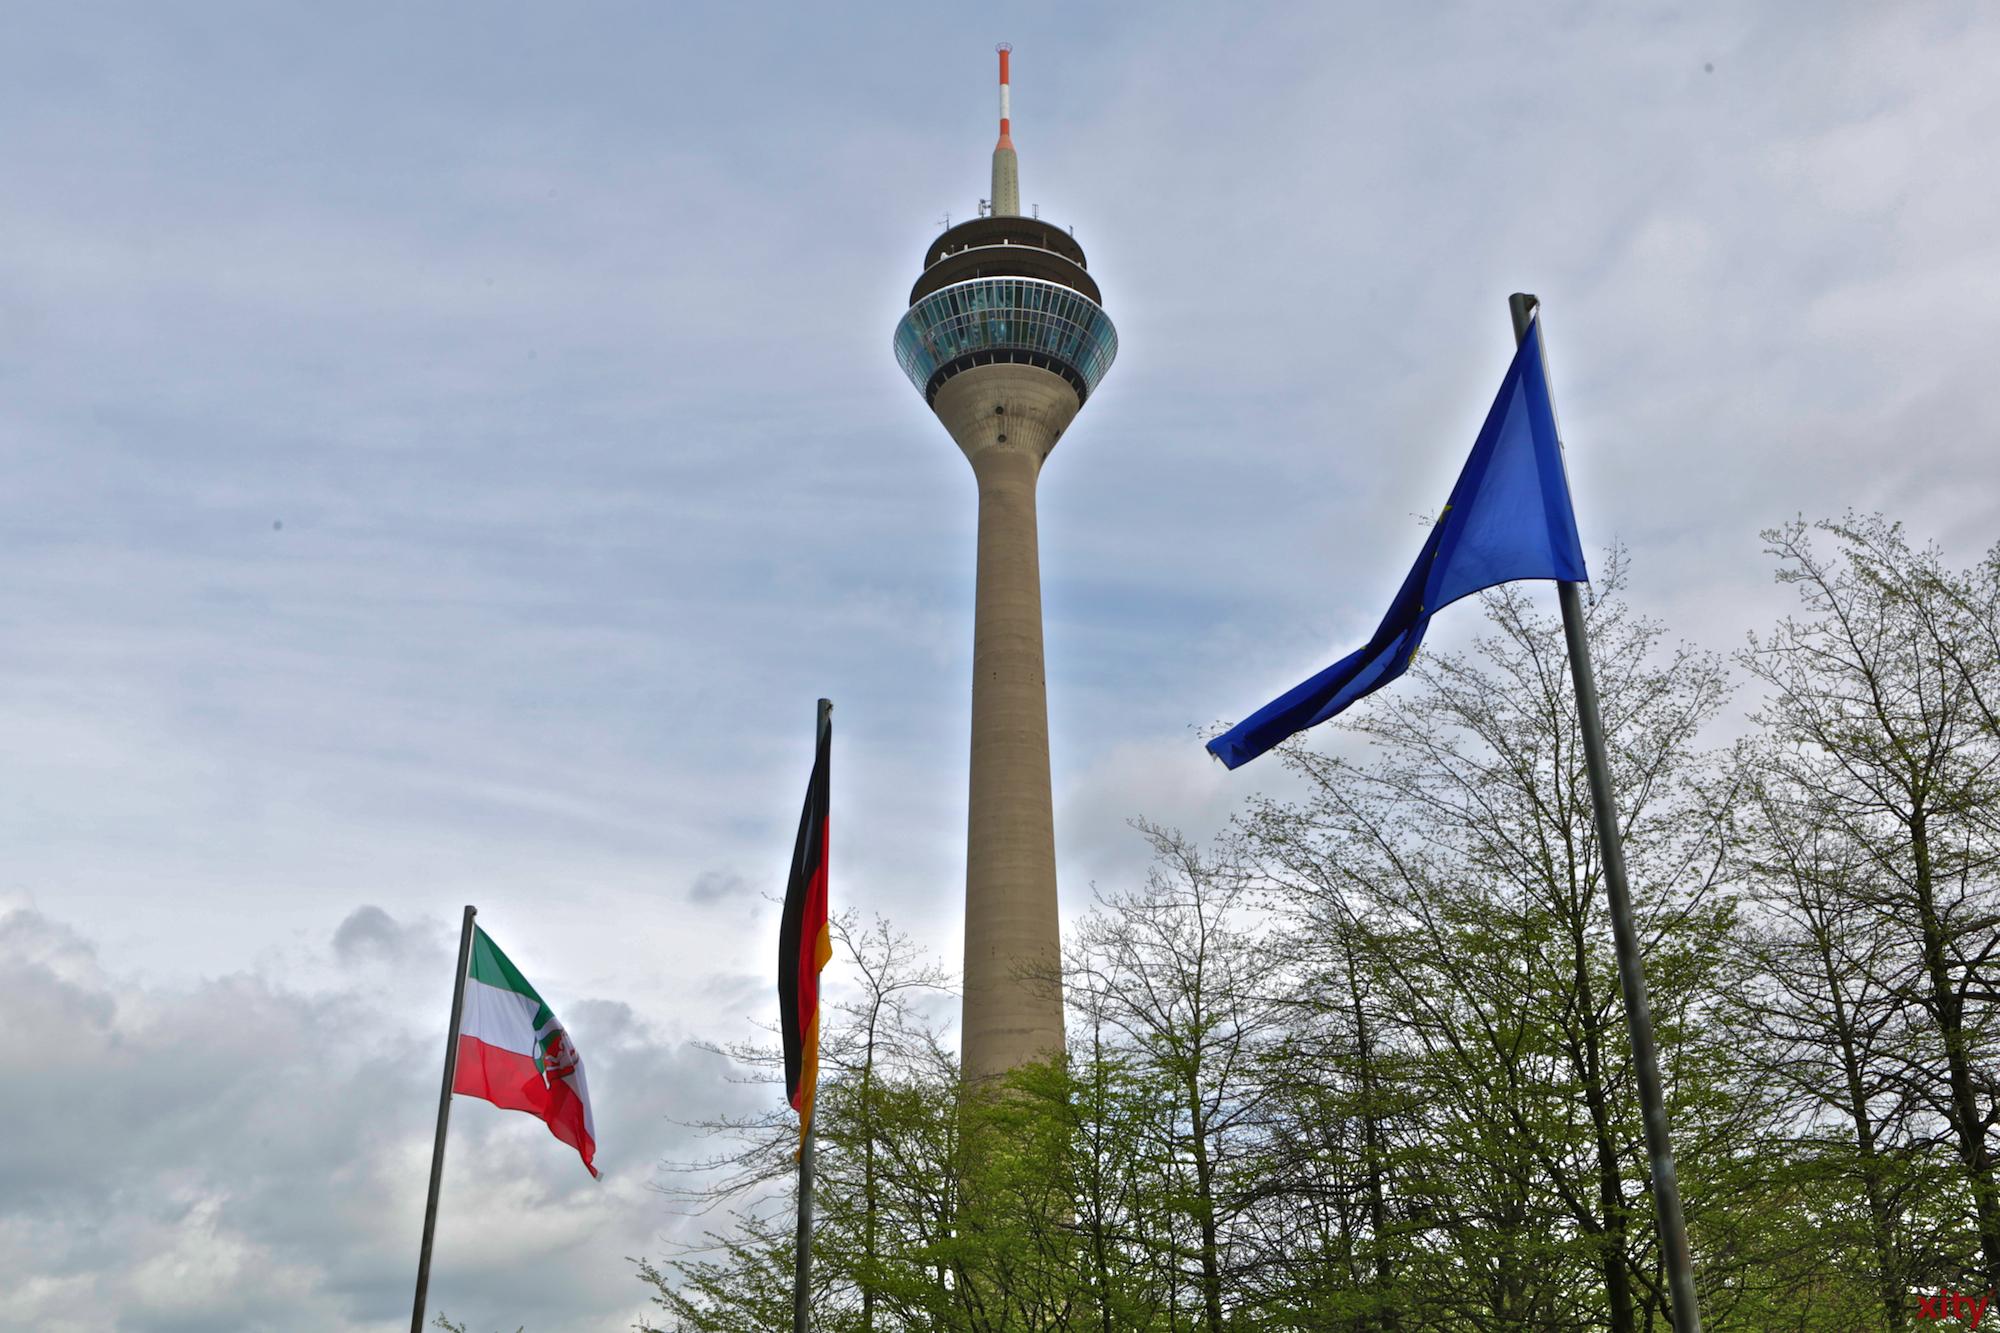 Daran erkennt man Düsseldorf (Foto: xity)